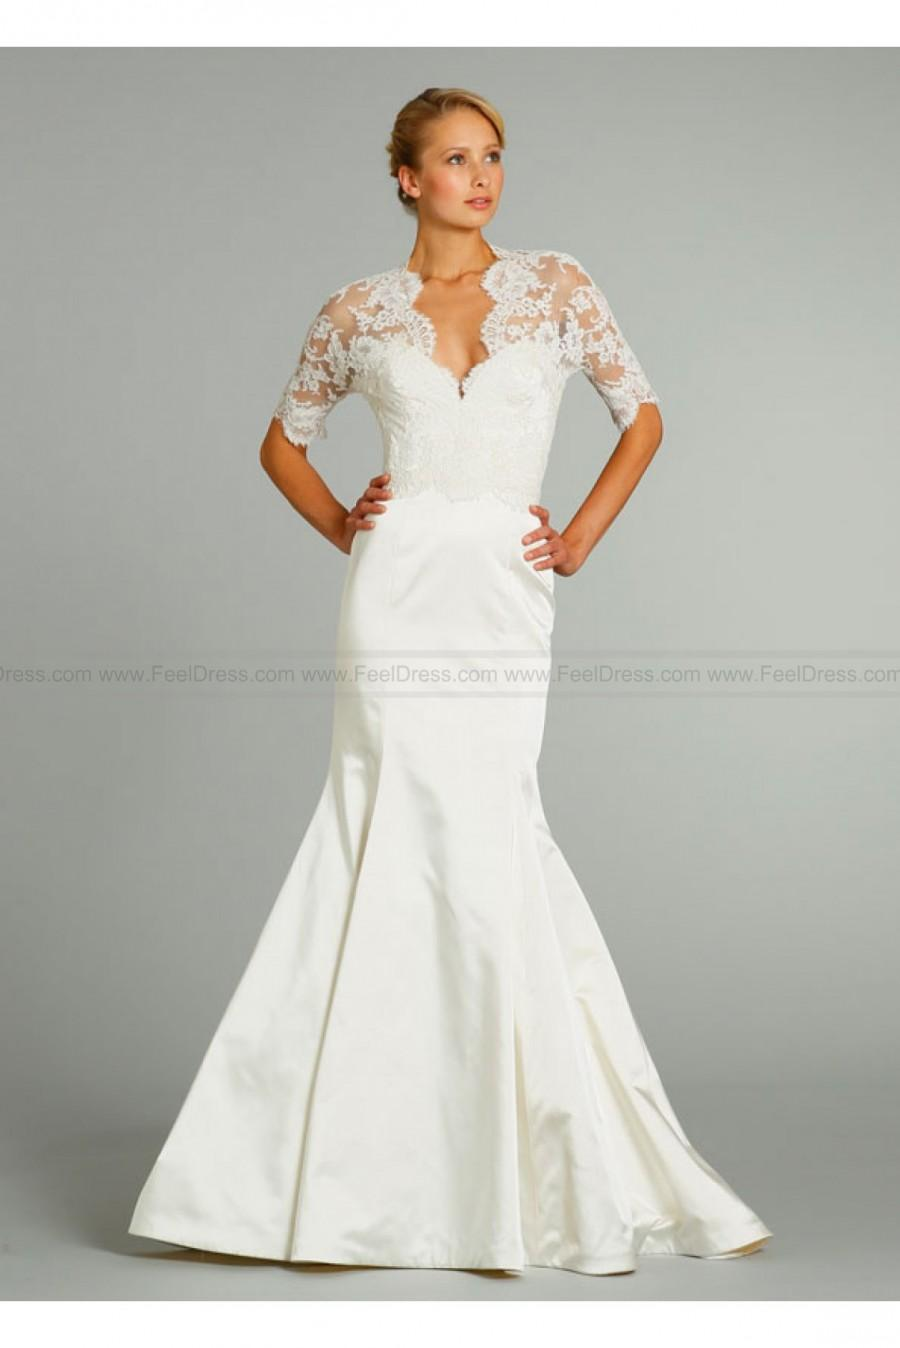 Jim Heljm Wedding Dresses.Jim Hjelm Wedding Dress Style Jh8256 2450576 Weddbook